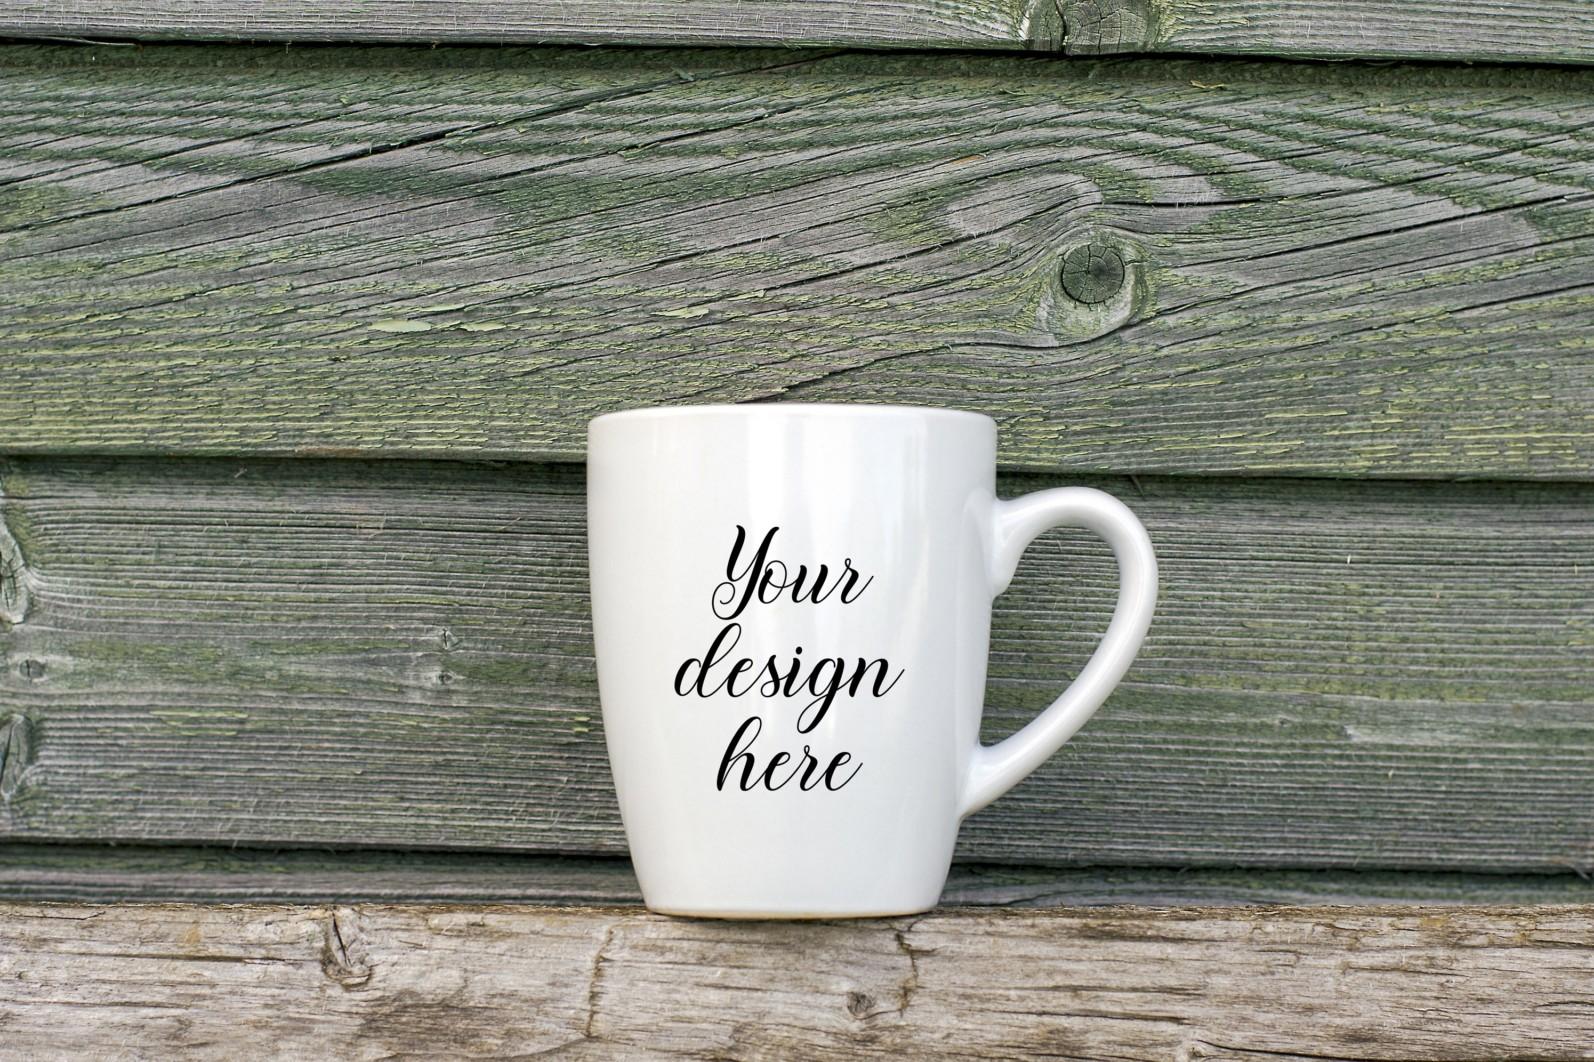 Coffee mug mockup bundle. Mug template bundle. PSD, JPEG files. - 10 1 1 scaled -